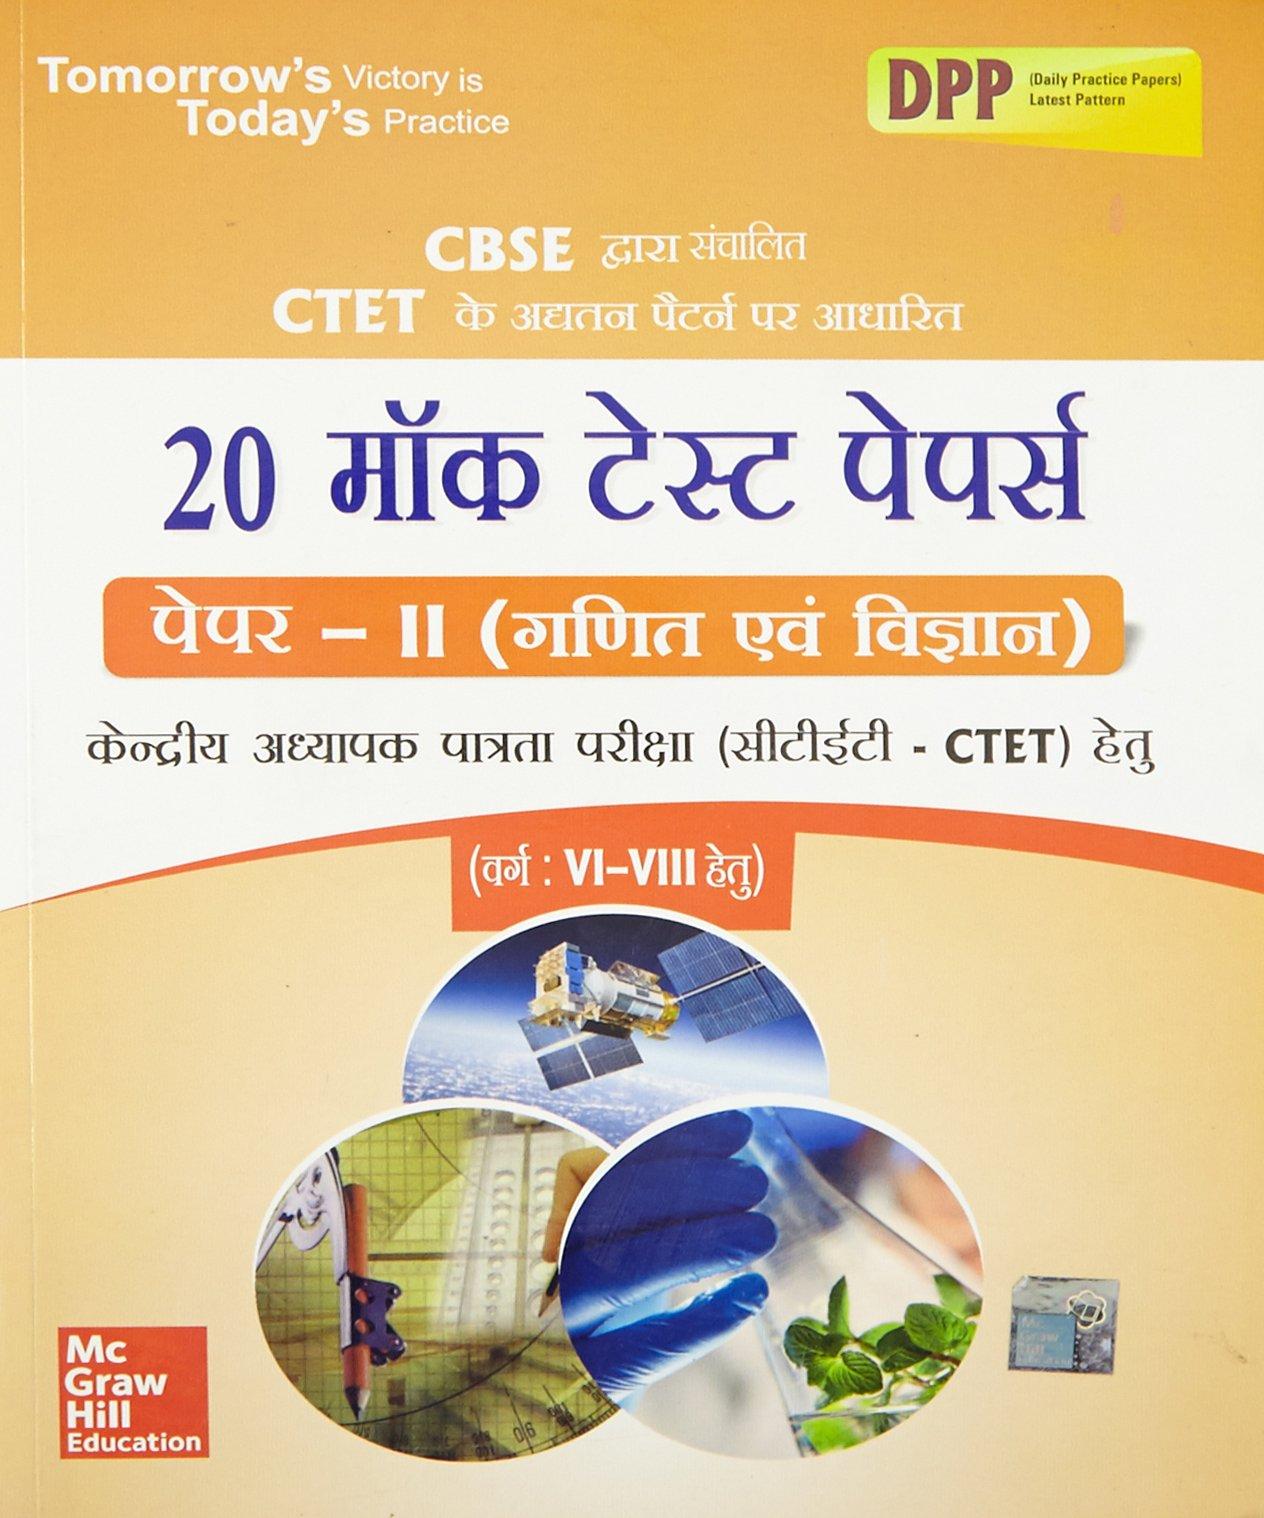 Read Online CTET 20 MOCk Test Papers For Paper - II Ganit Evam Vigyan (Varg VI - Viii) PB pdf